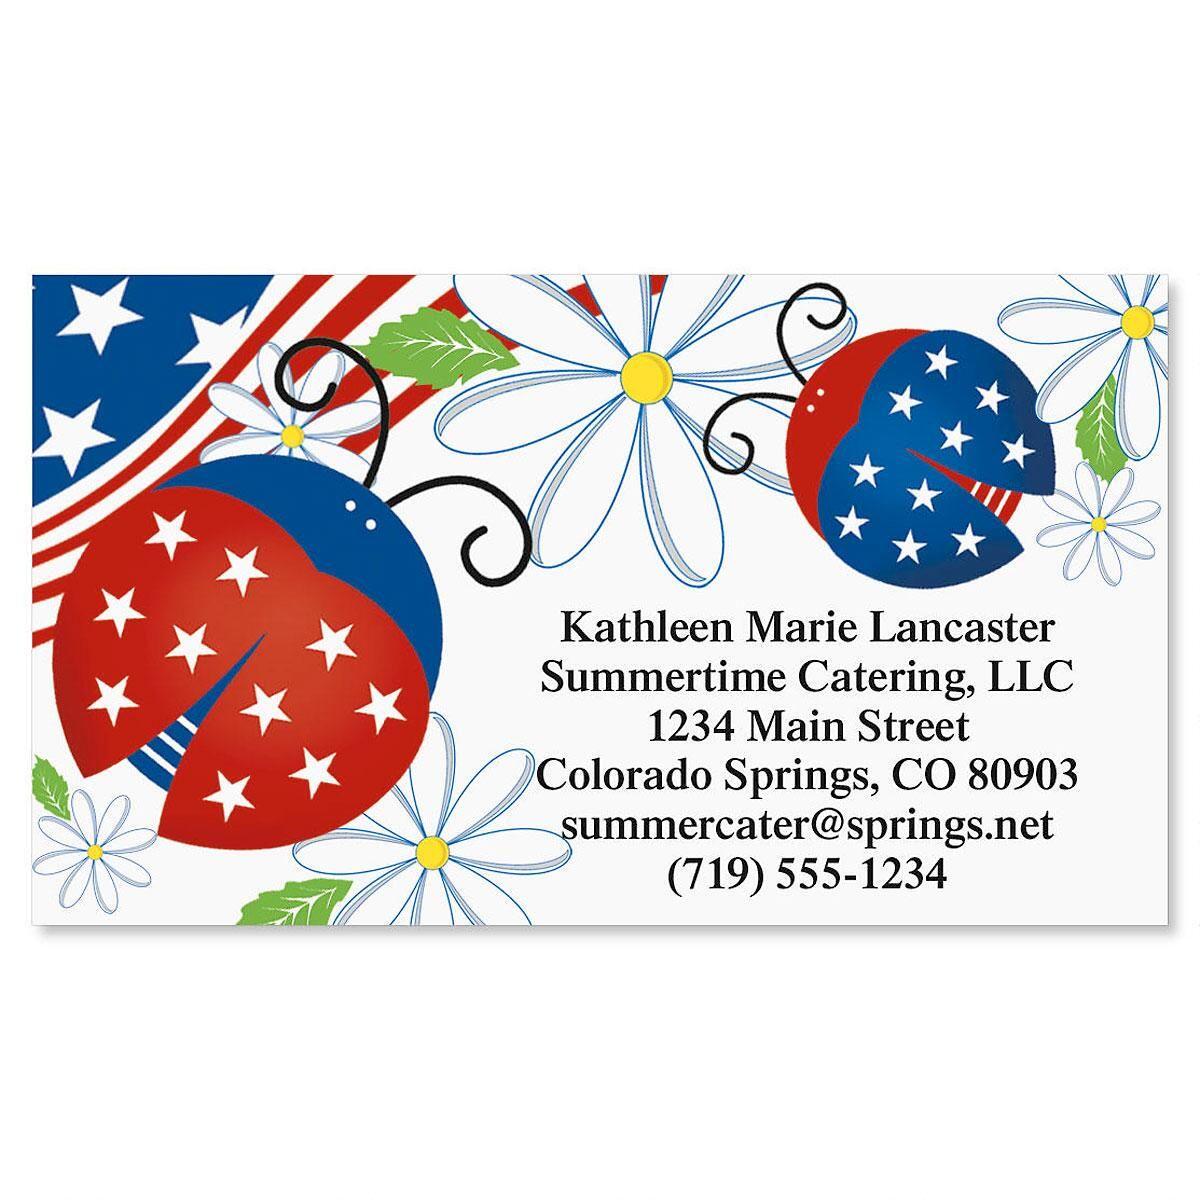 Patriotic ladybug business cards colorful images patriotic ladybug business cards colourmoves